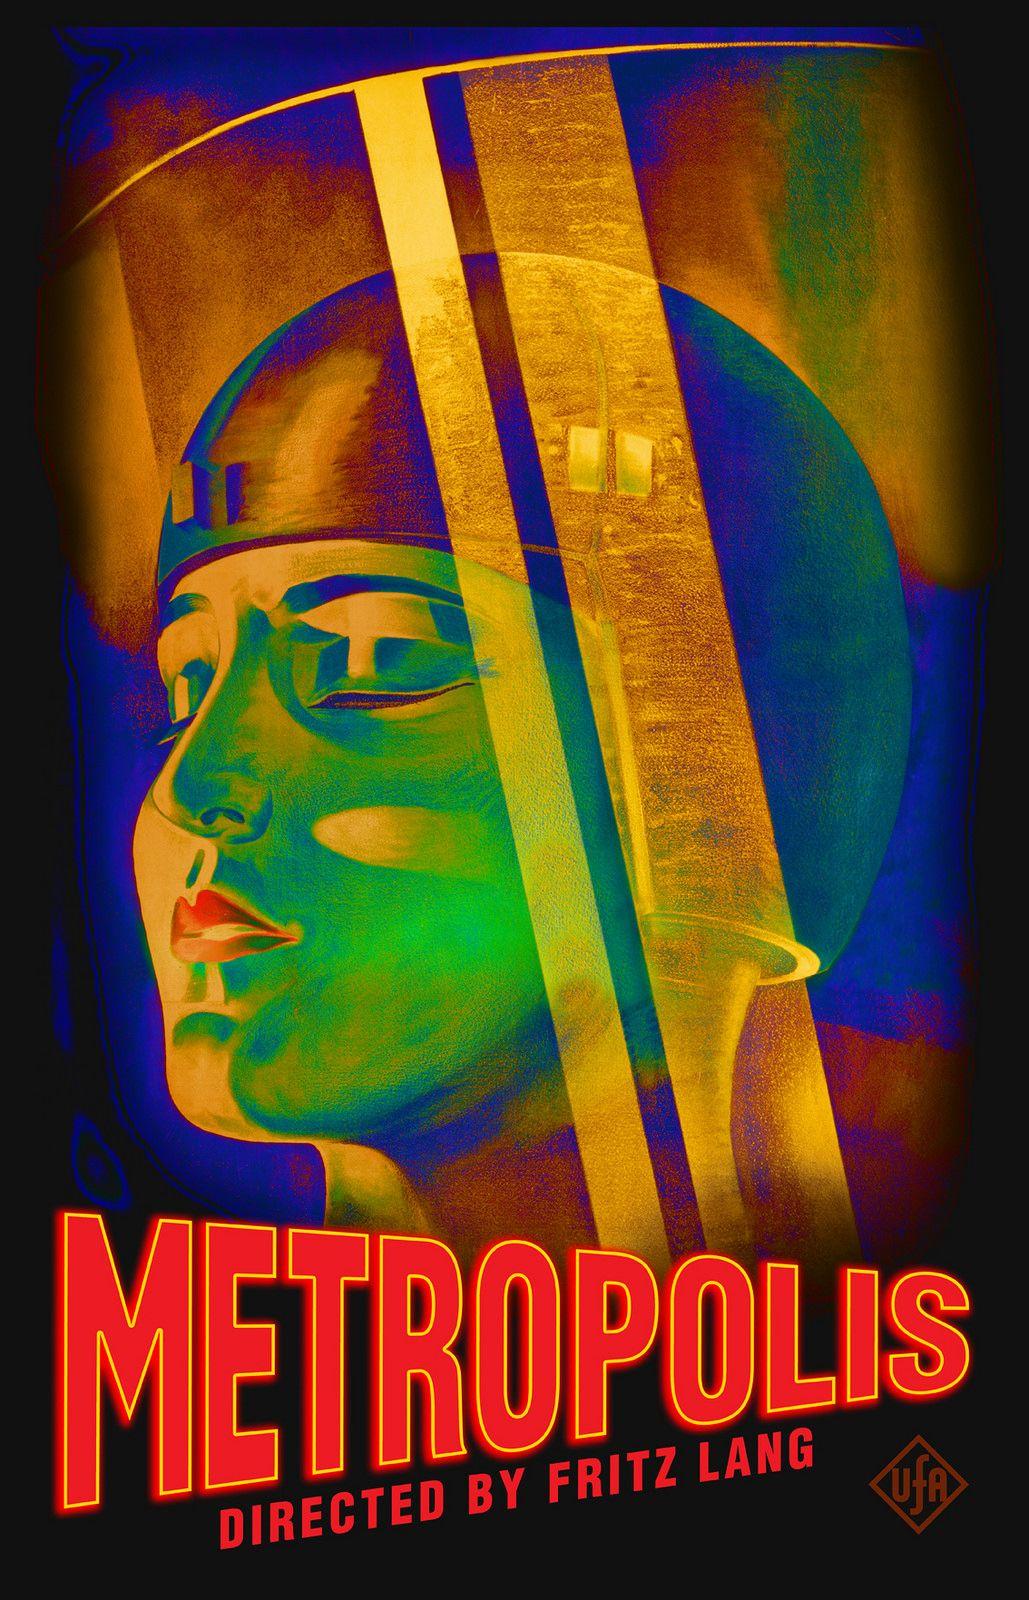 Langmetropolissm Movie Posters Vintage Classic Movie Posters Poster Art